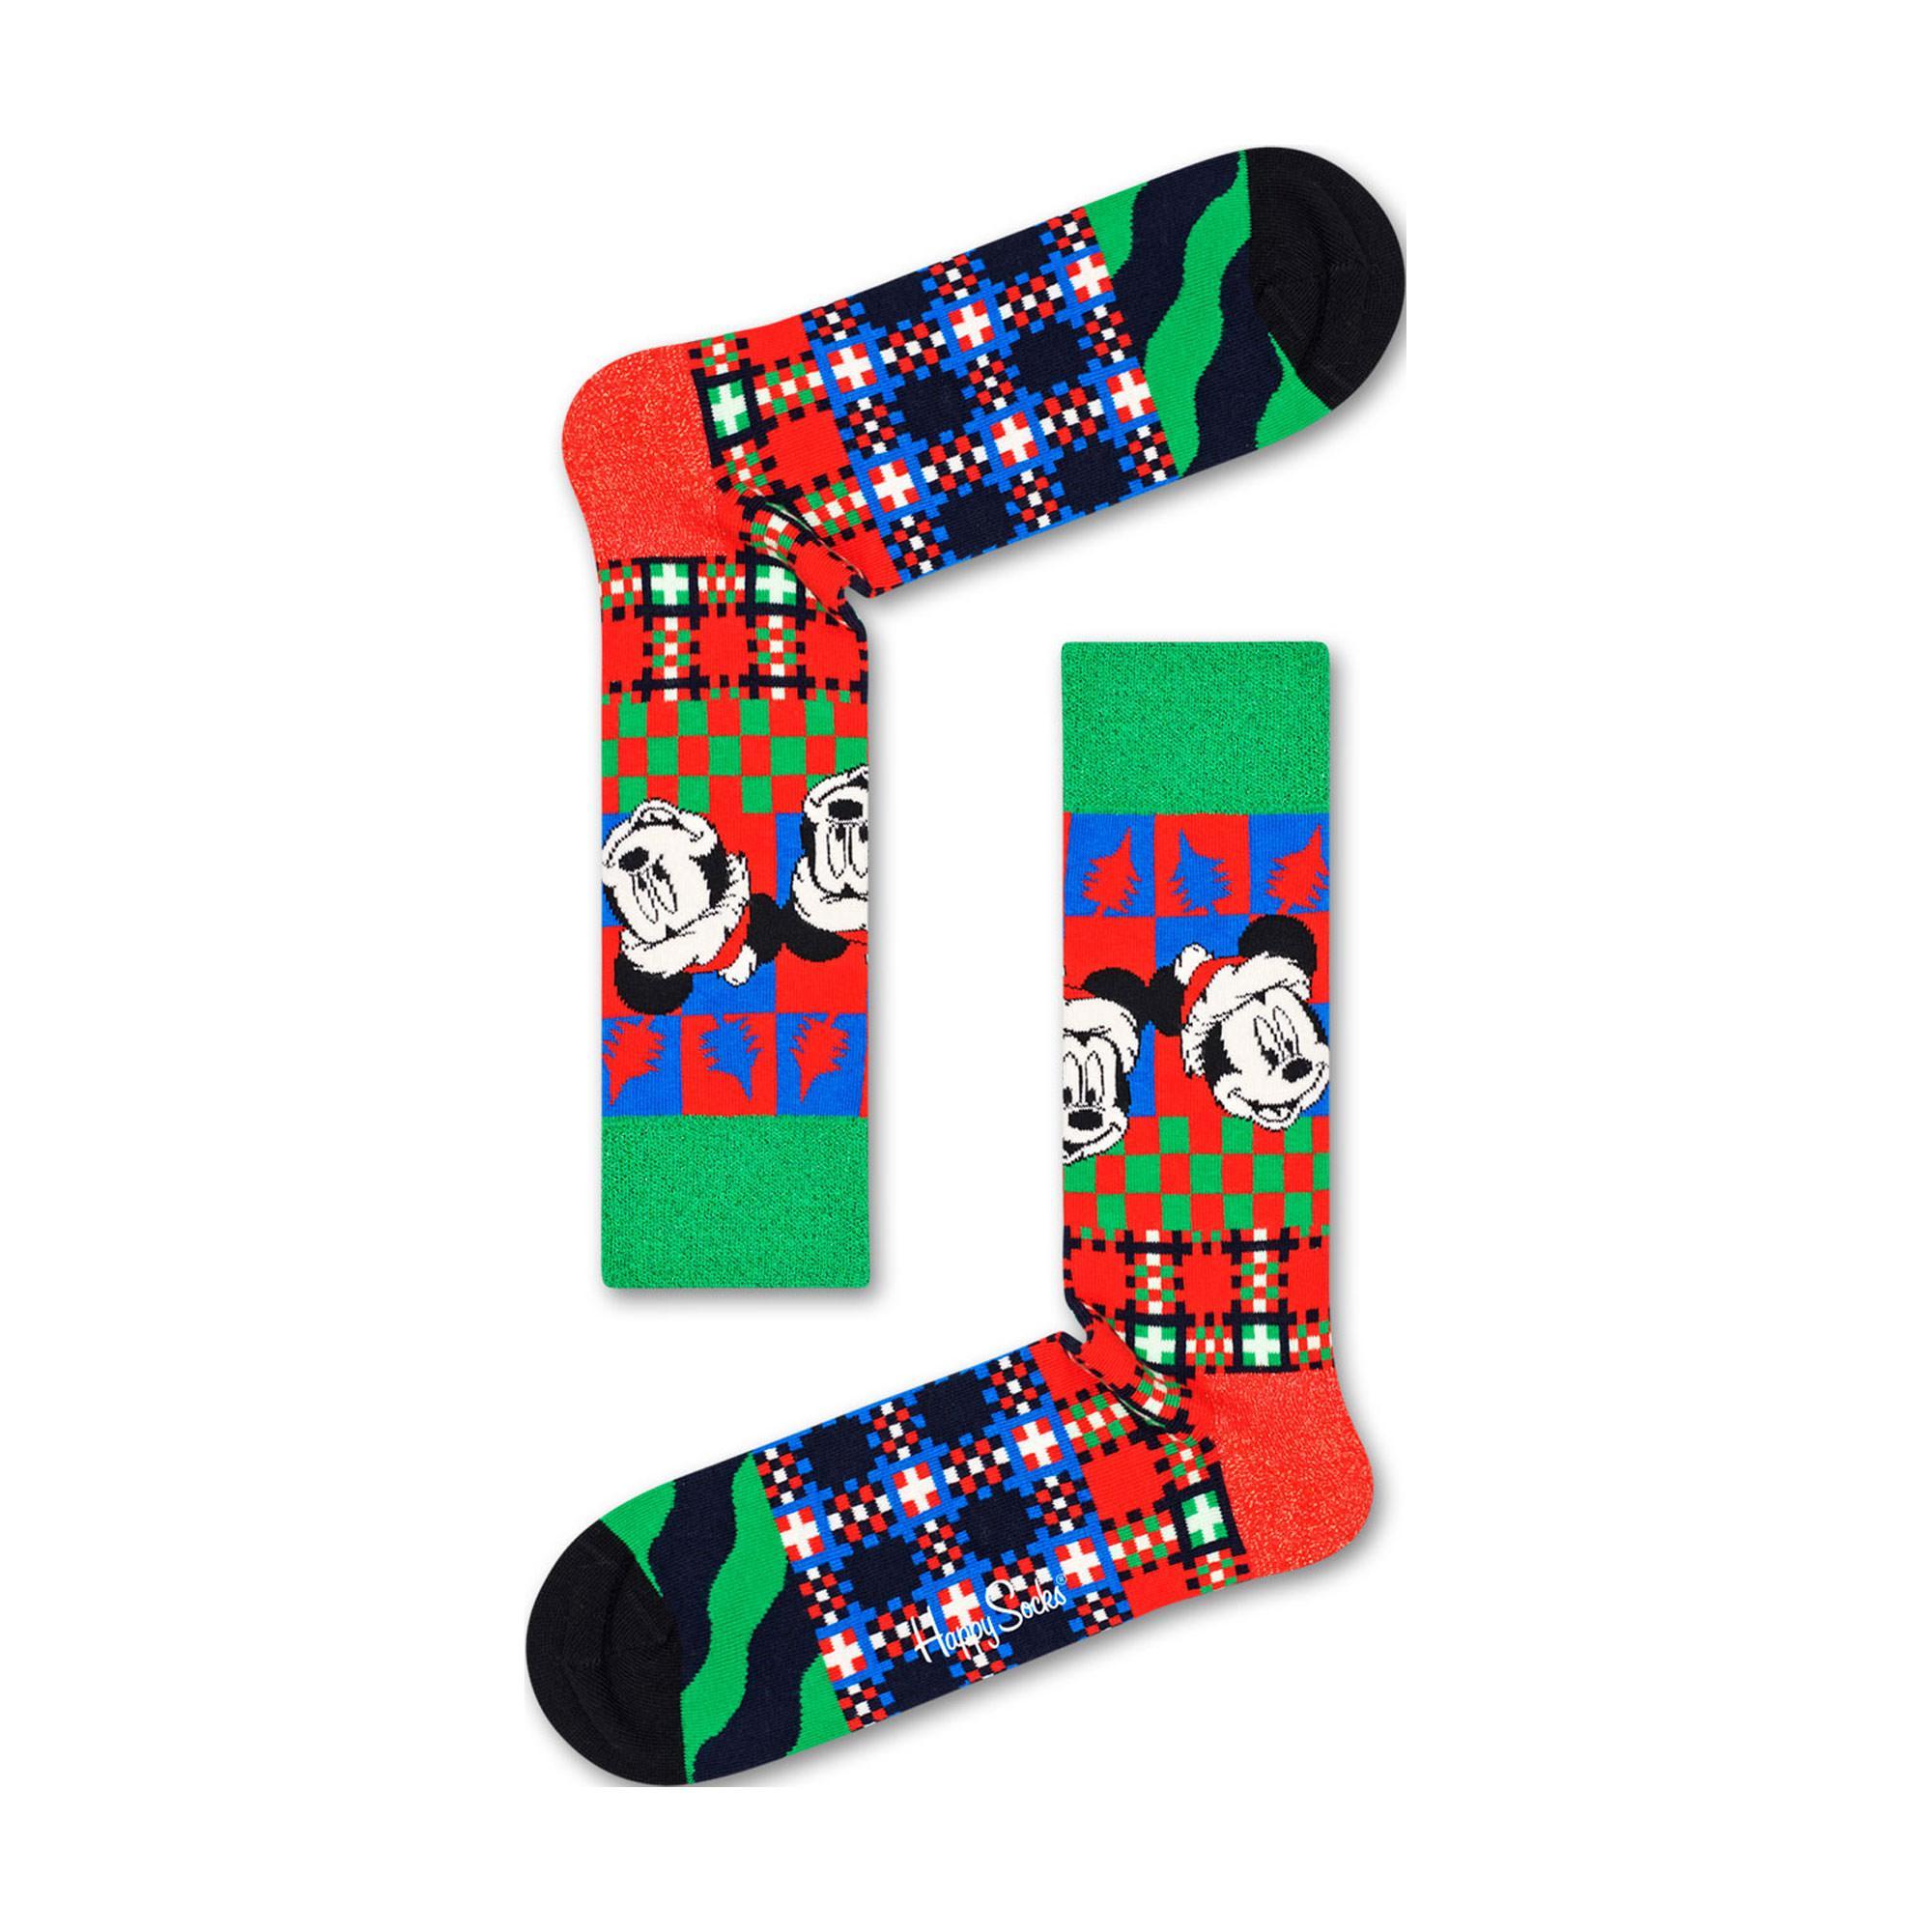 Tis the Season Socks